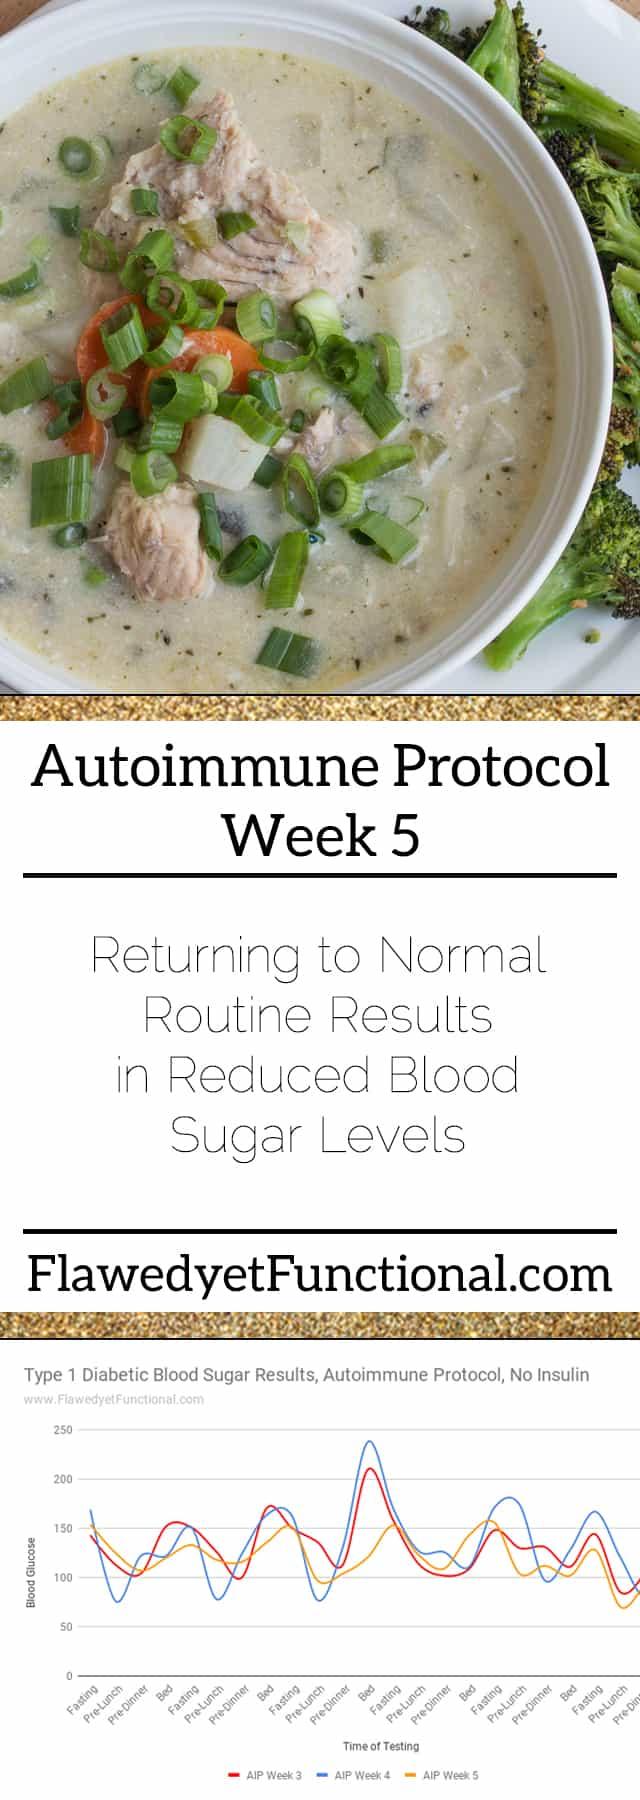 Autoimmune Protocol Week 5